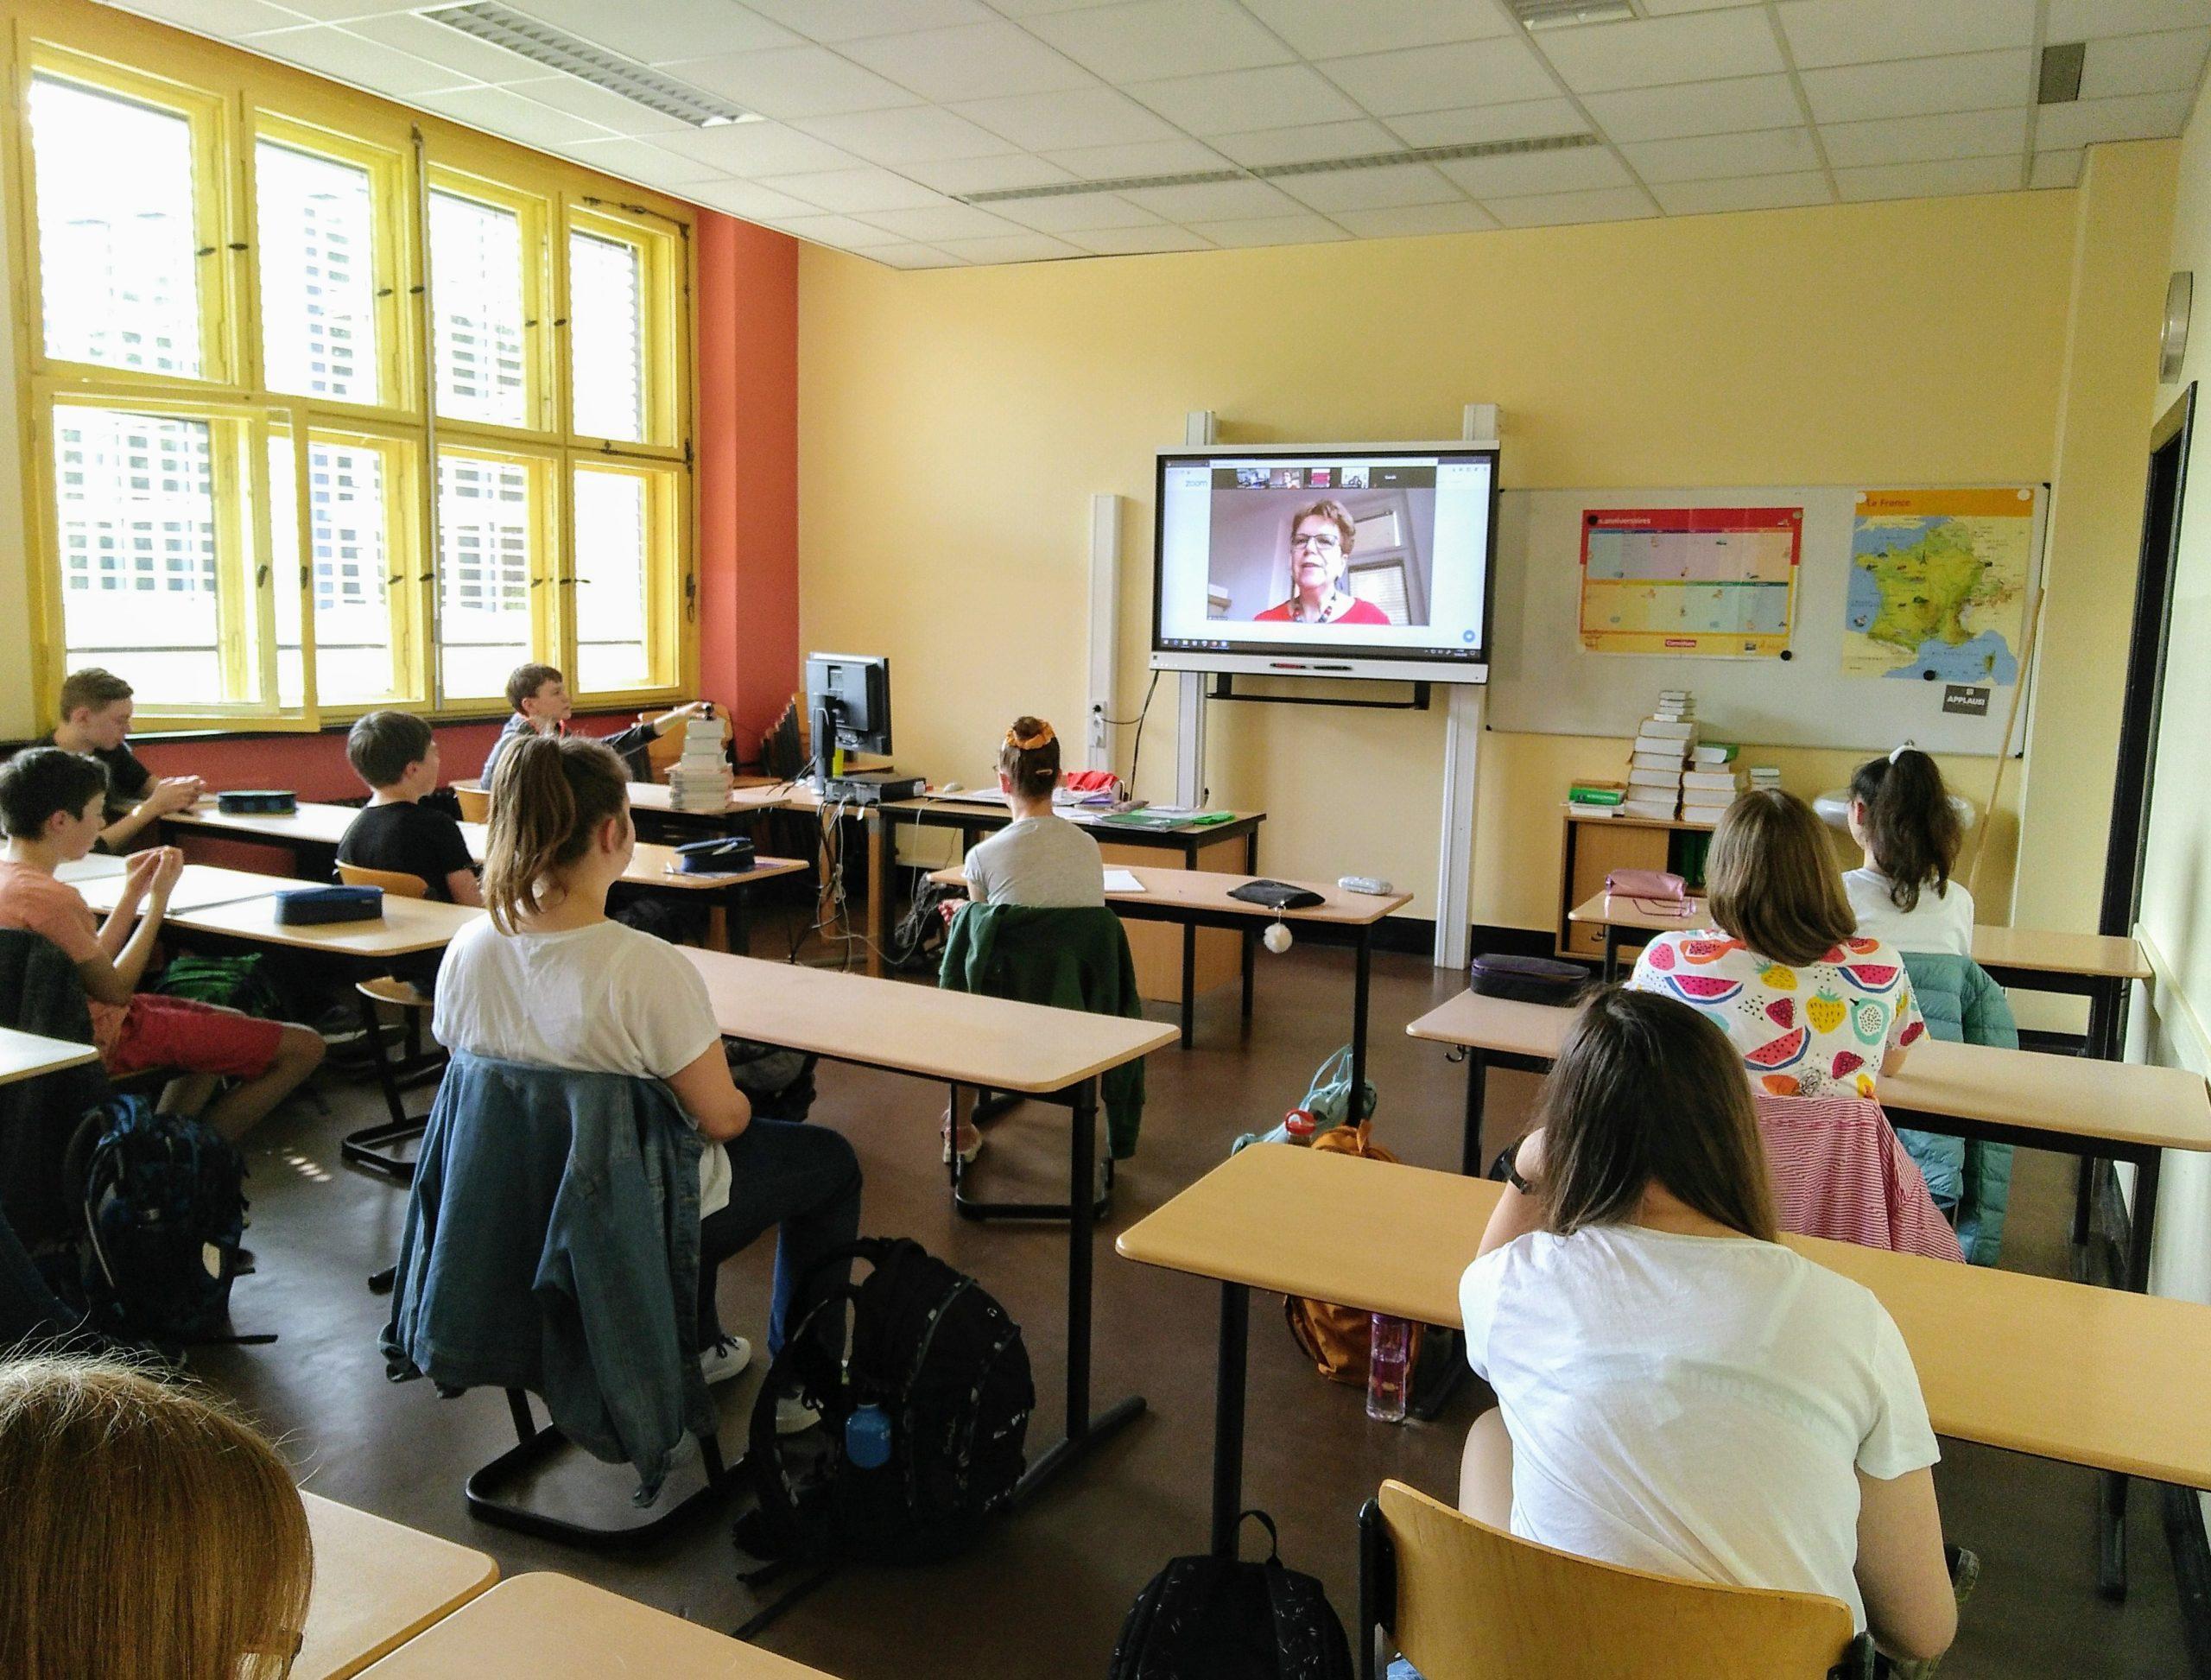 Europa im Klassenzimmer!